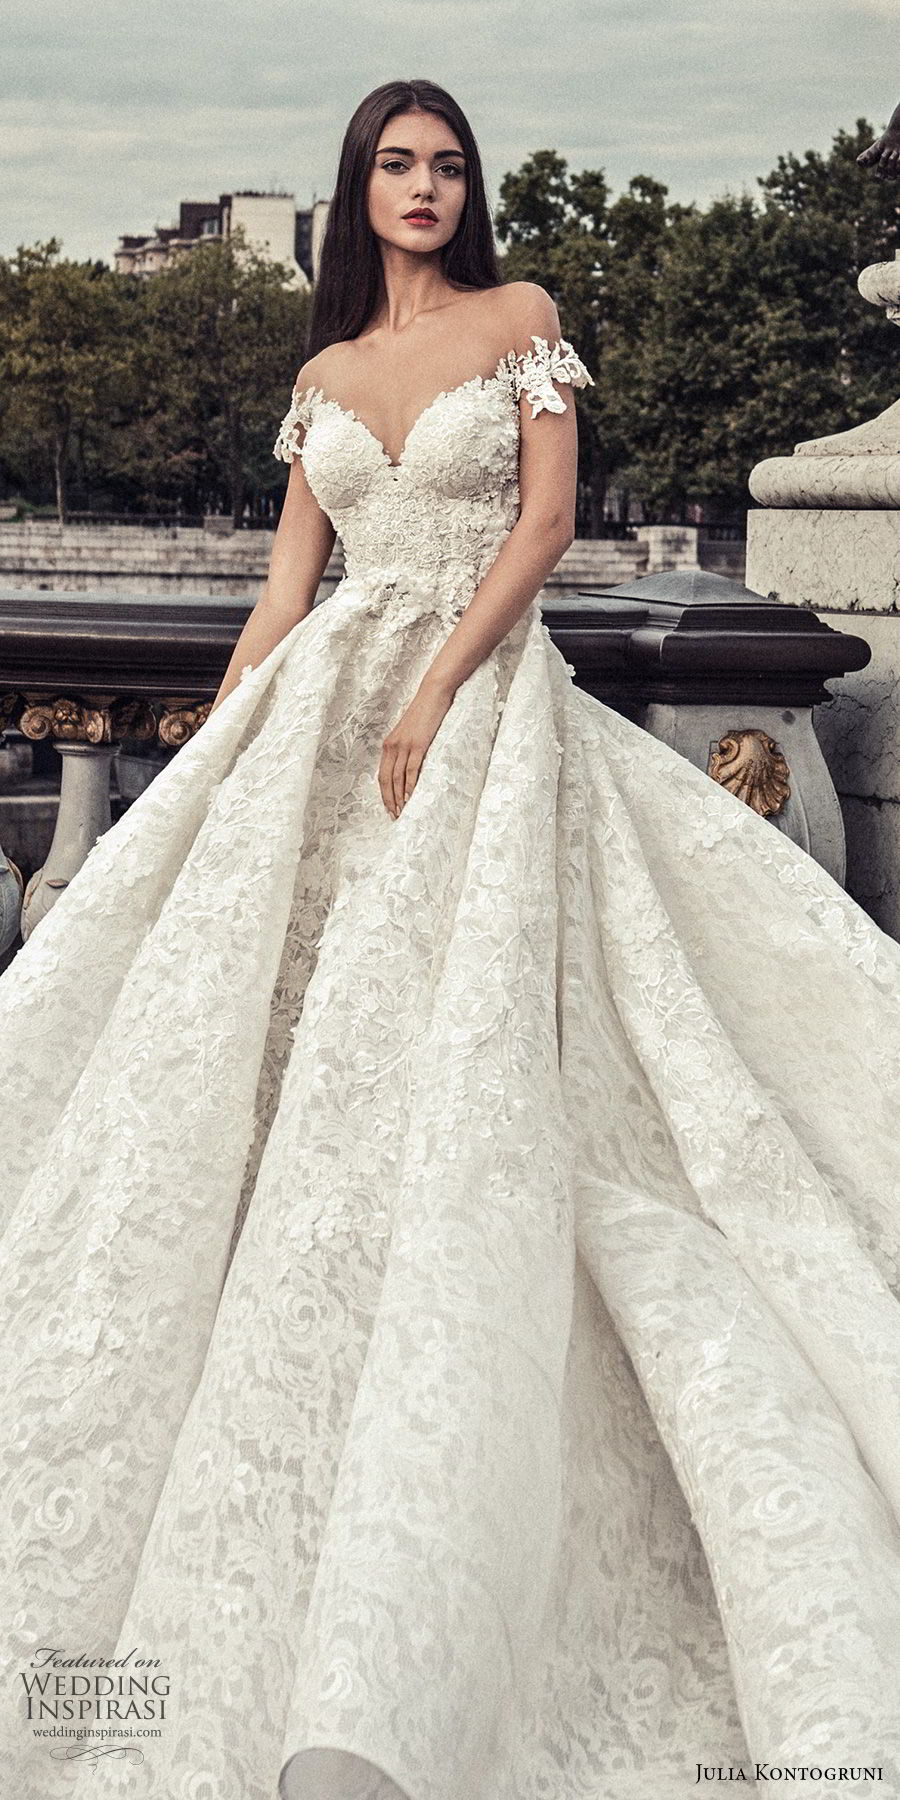 julia kontogruni 2018 bridal off the shoulder sweetheart neckline princess ball gown wedding dress sheer button back royal train (3) zv